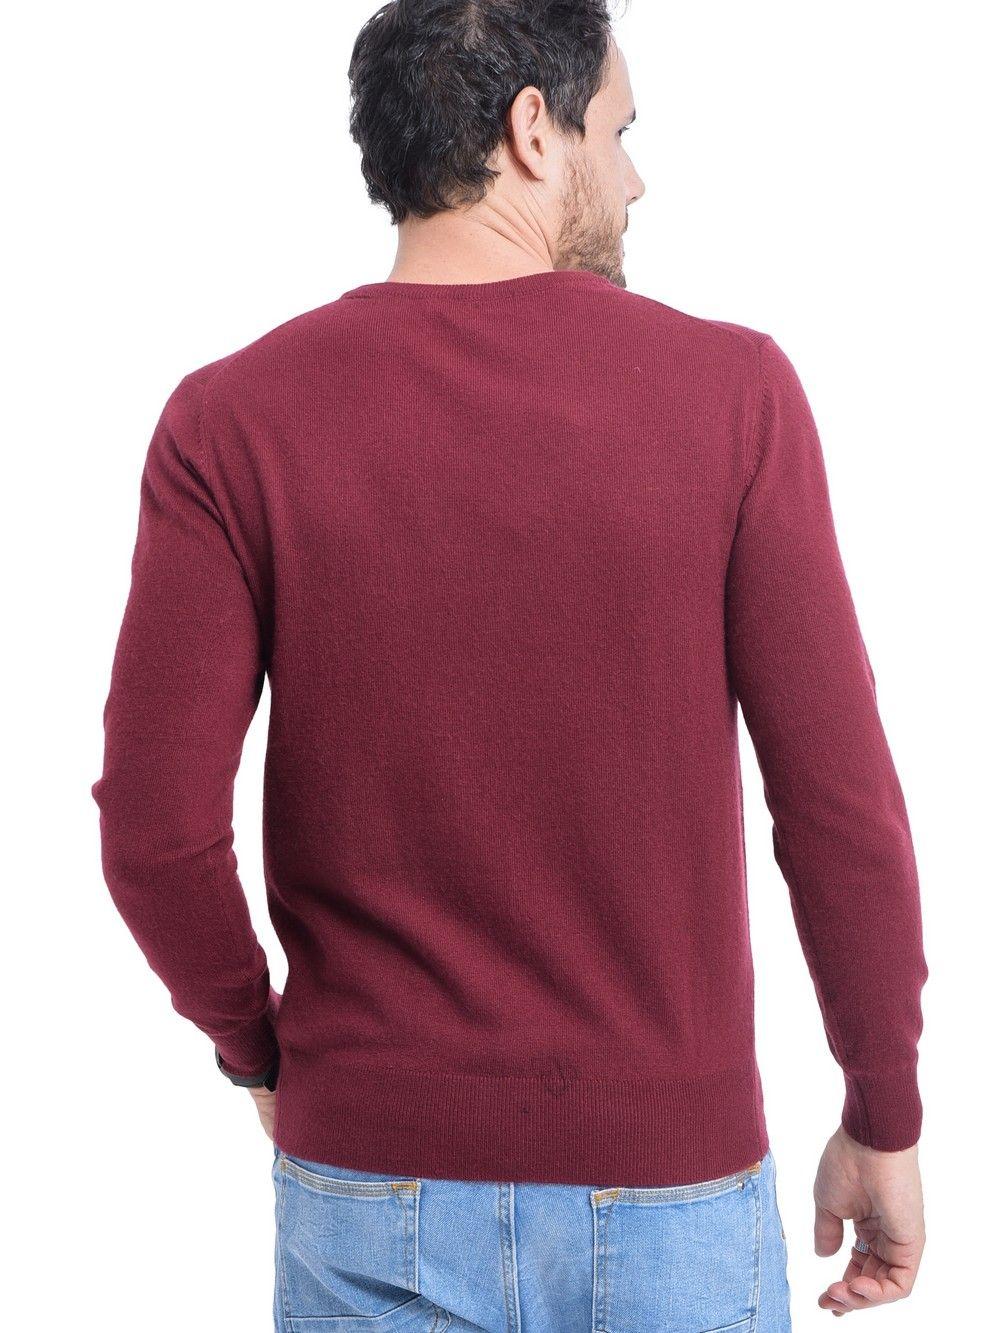 C&JO Round Neck Sweater in Maroon